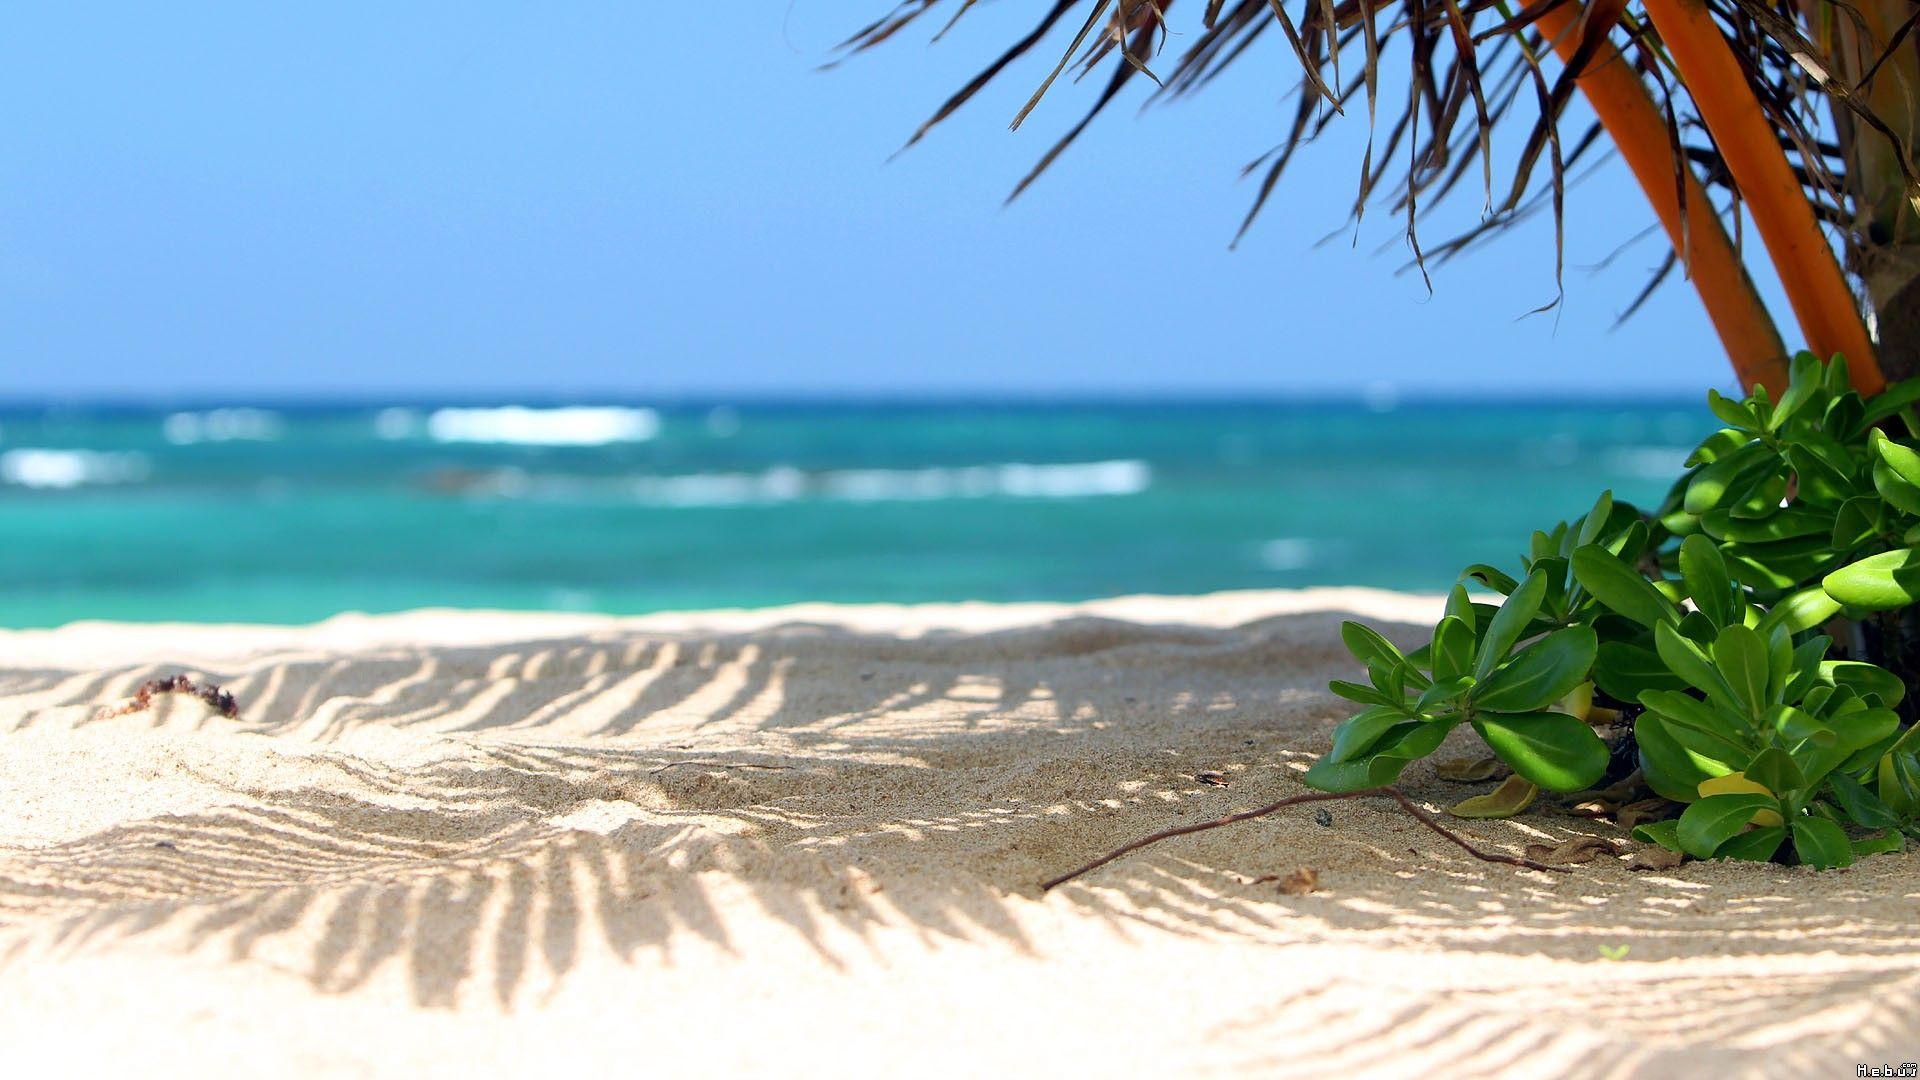 the beautiful seaside scenery - photo #5